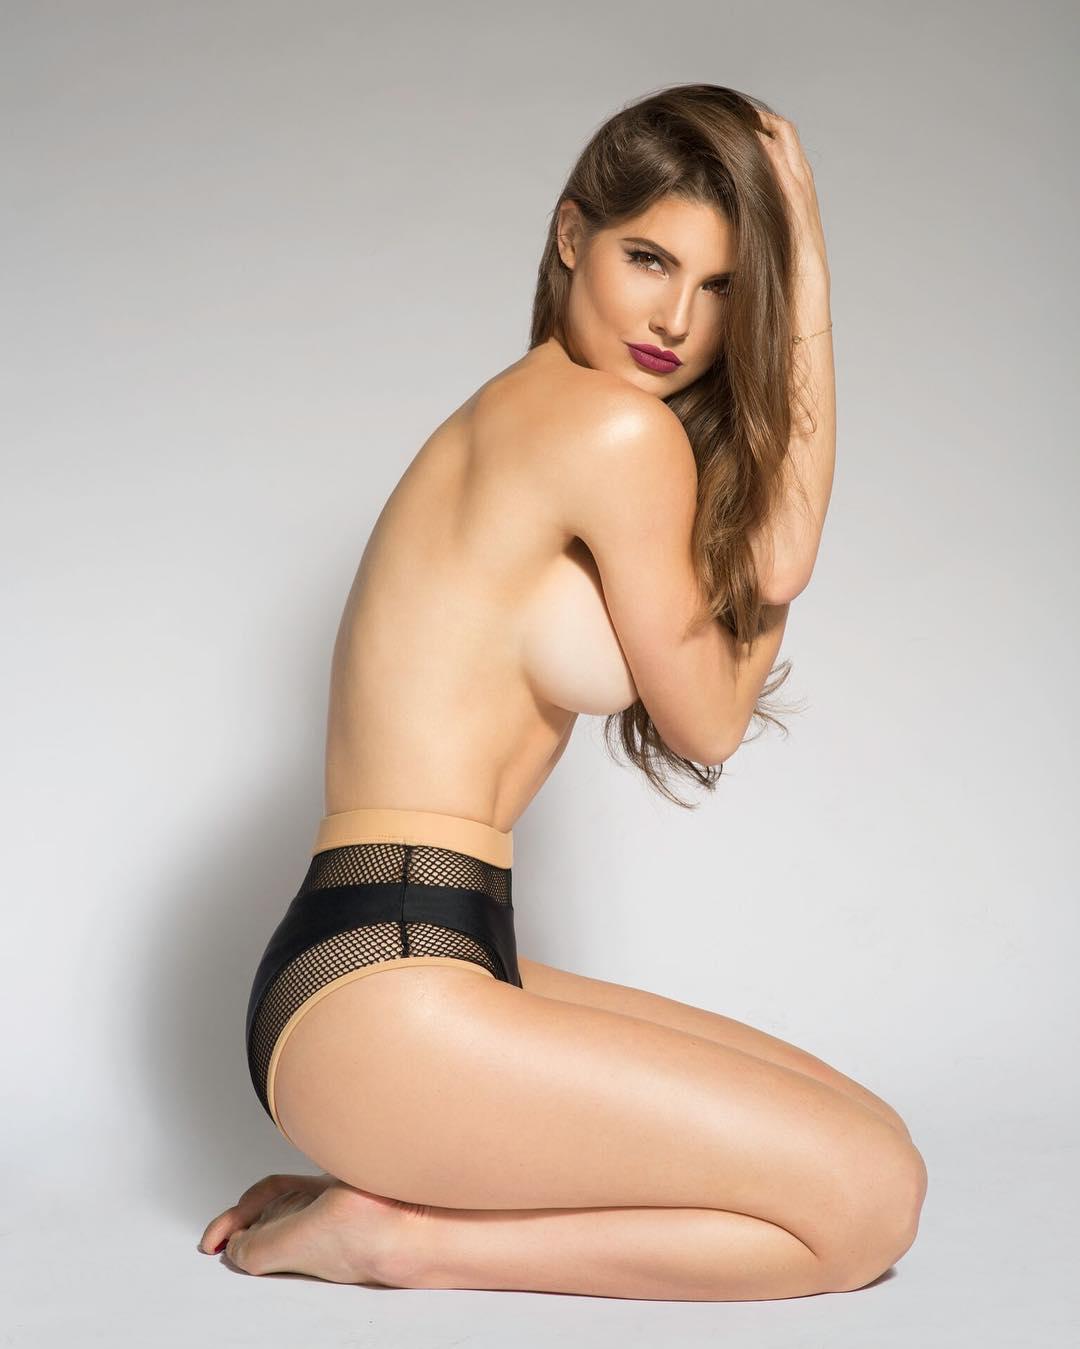 Amanda Cerny Nackt amanda cerny nackt porno | amanda cerny playboy pics. 2020-06-27